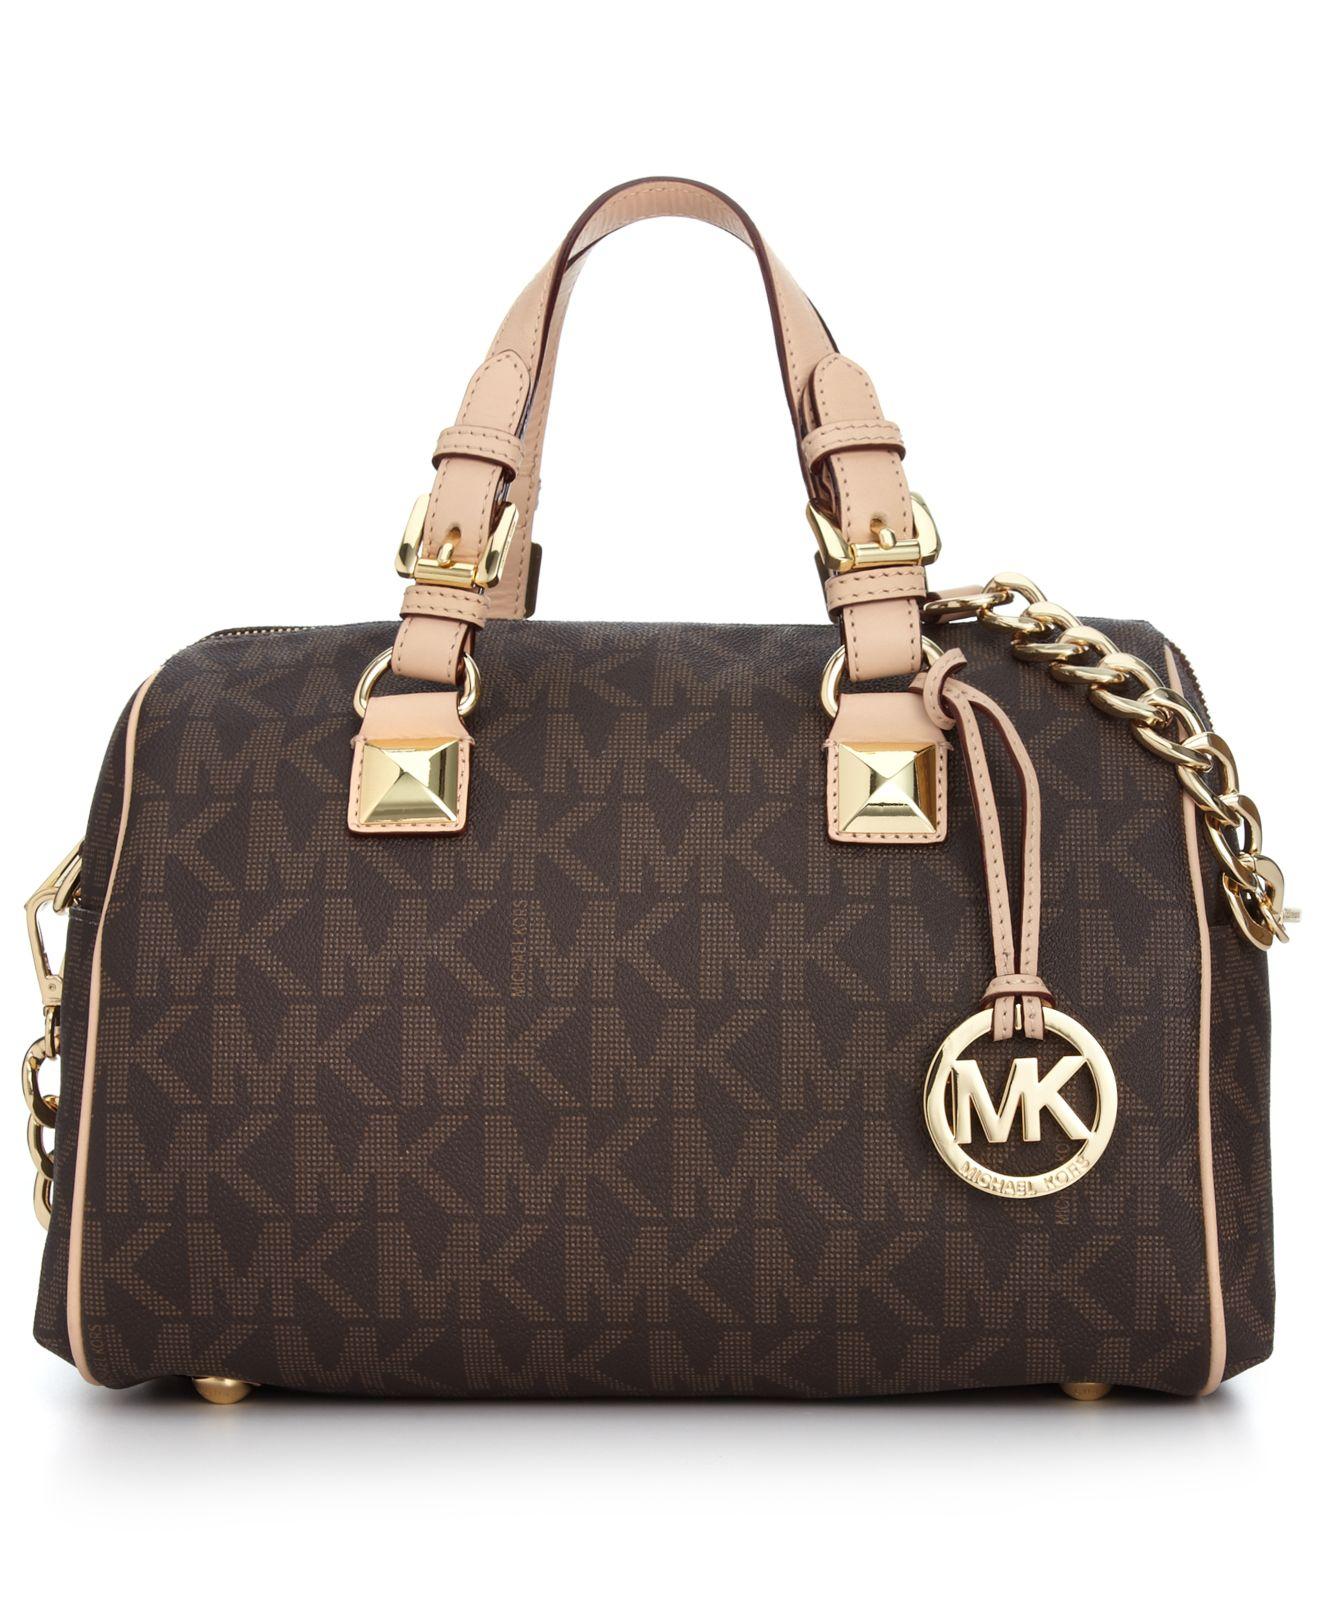 michael kors handbag grayson monogram medium satchel